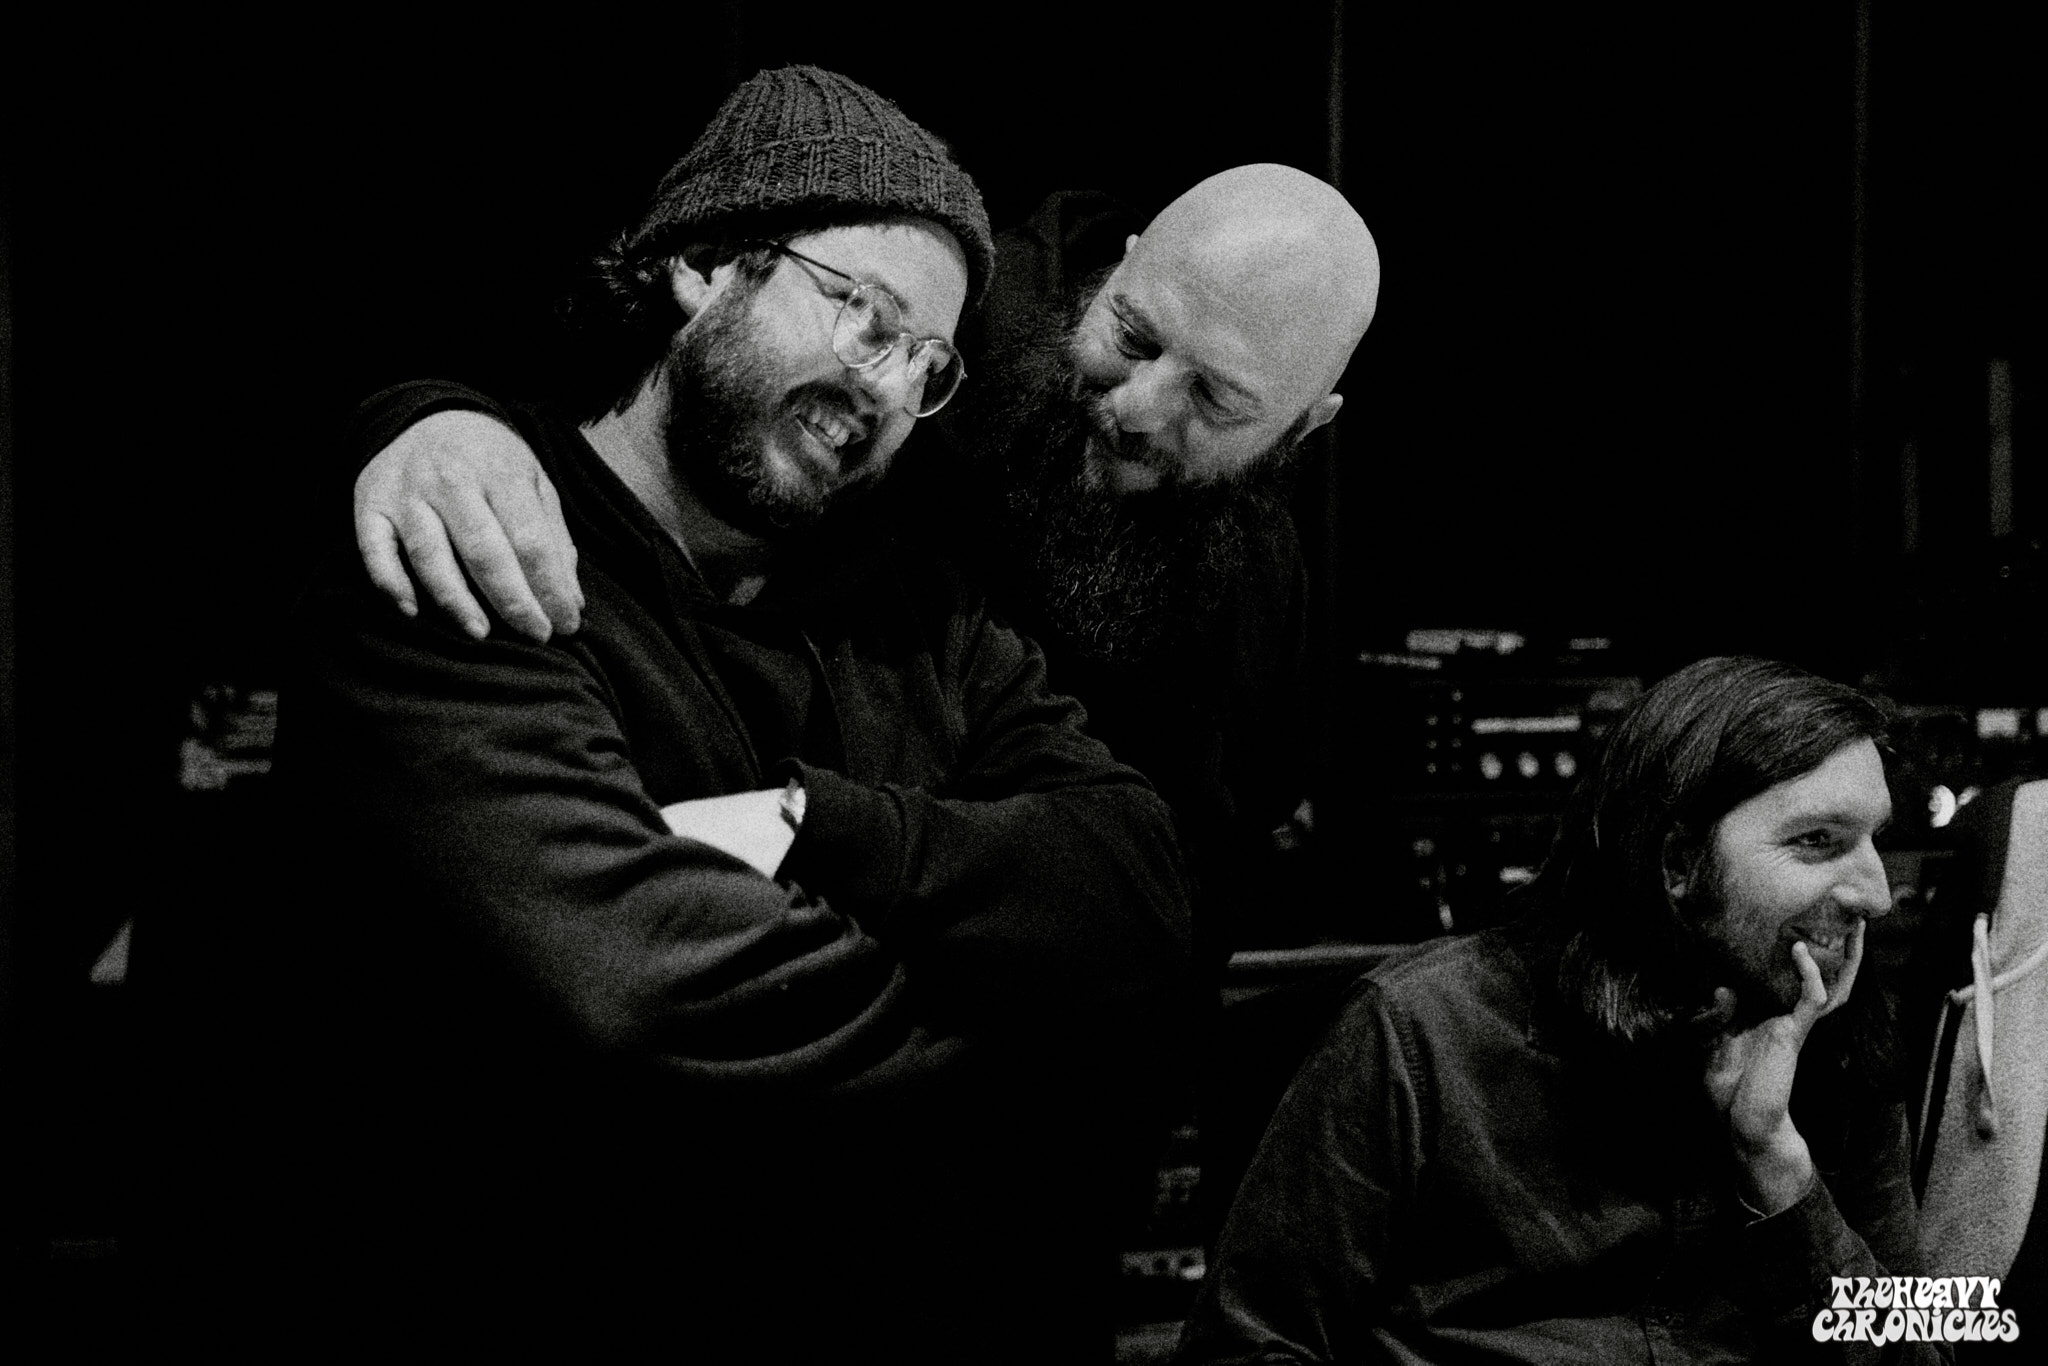 Elder-Studio-Black-Box-2019-Gael-Mathieu-The-Heavy-Chronicles-43